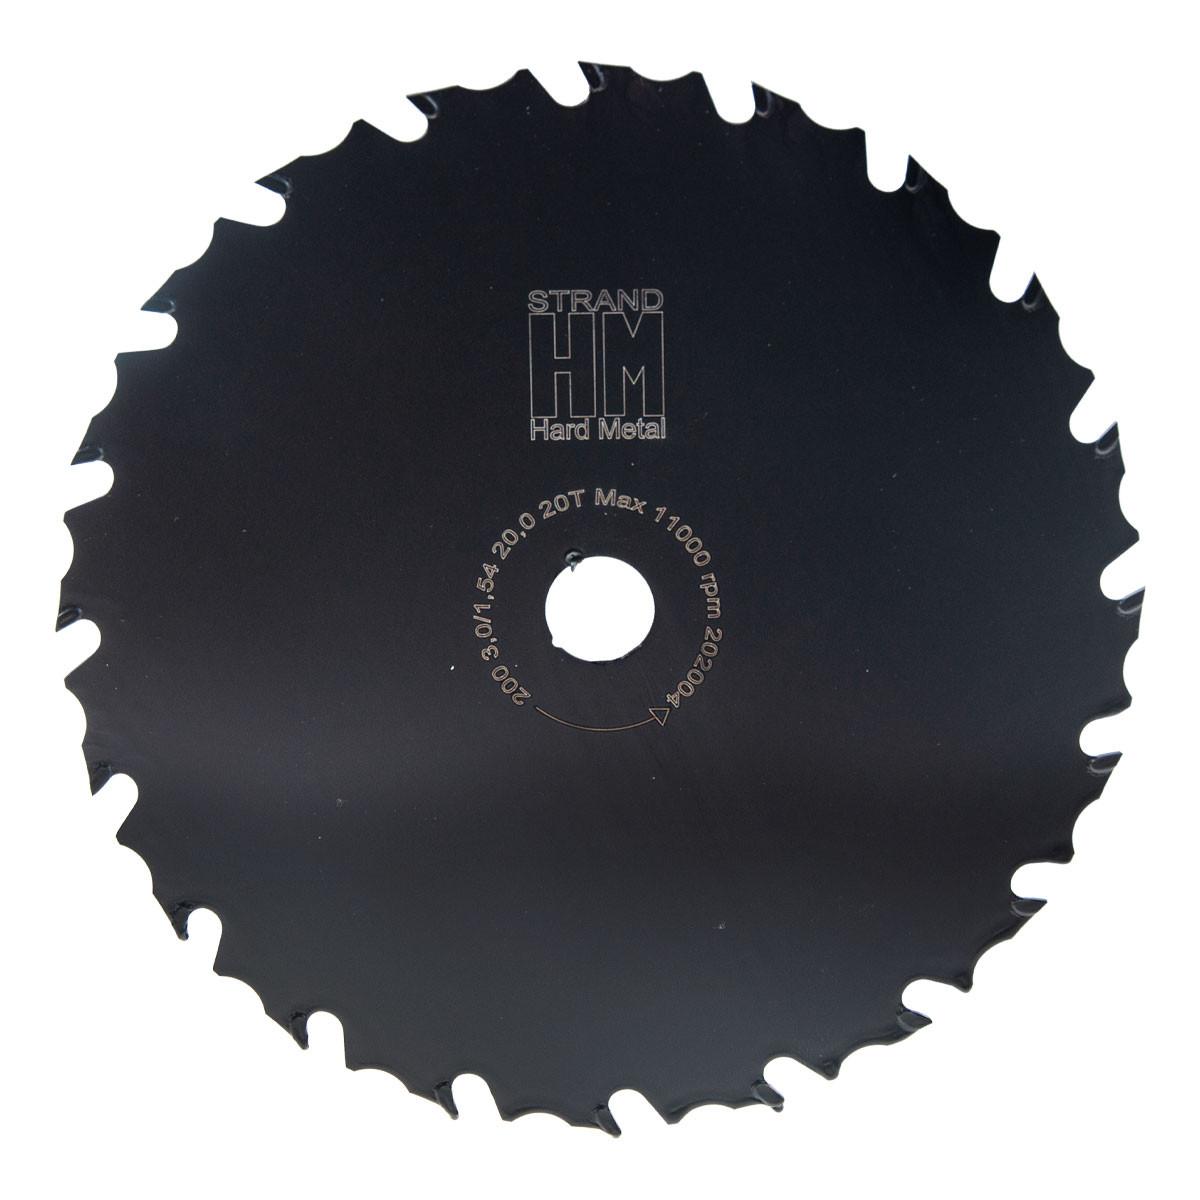 Raivaussahan terä 225 mm STRAND-HM: 20mm keskireikä, Z20, kovapala